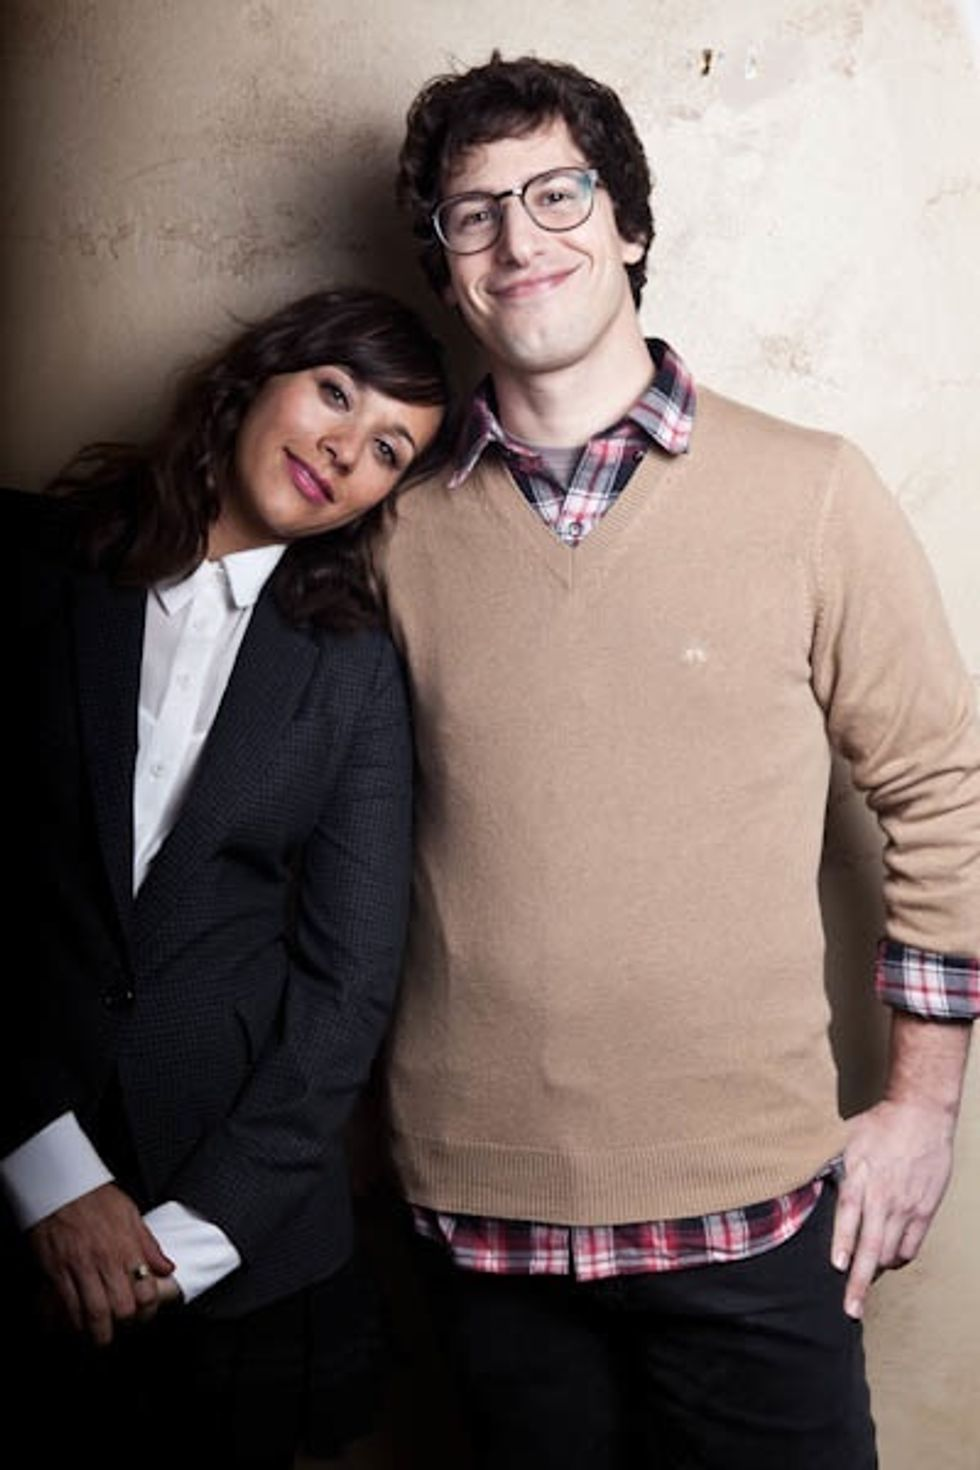 Andy Samberg and Rashida Jones Cuddle at Sundance